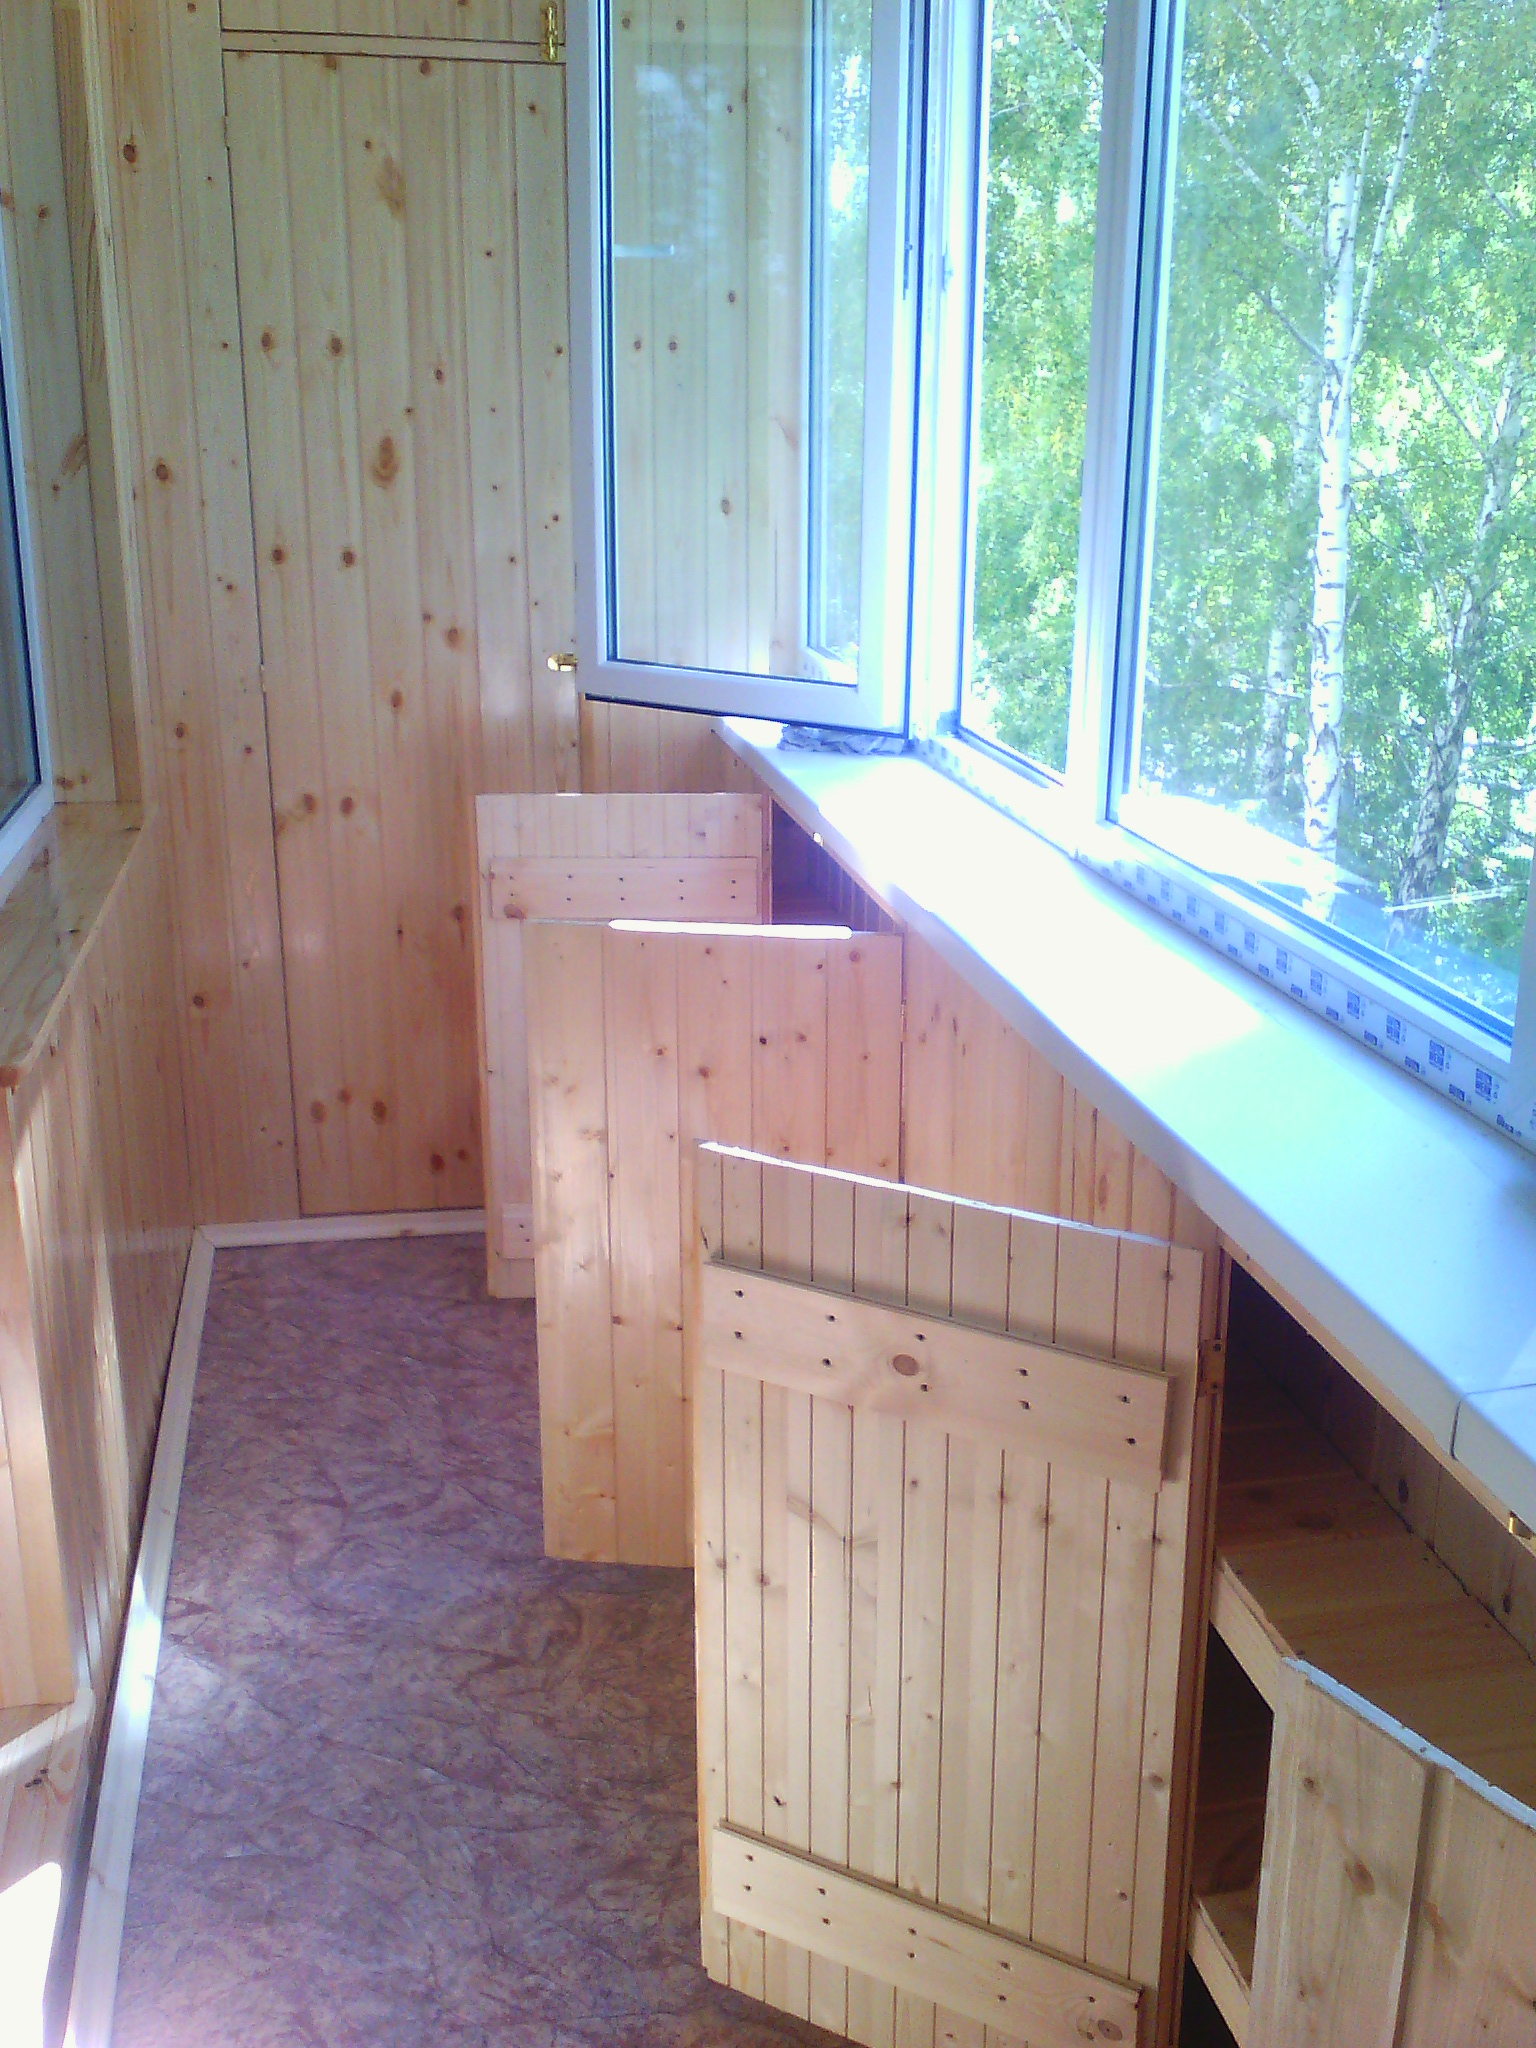 Уфа обшить балкон фото видео. - лоджии - каталог статей - ба.